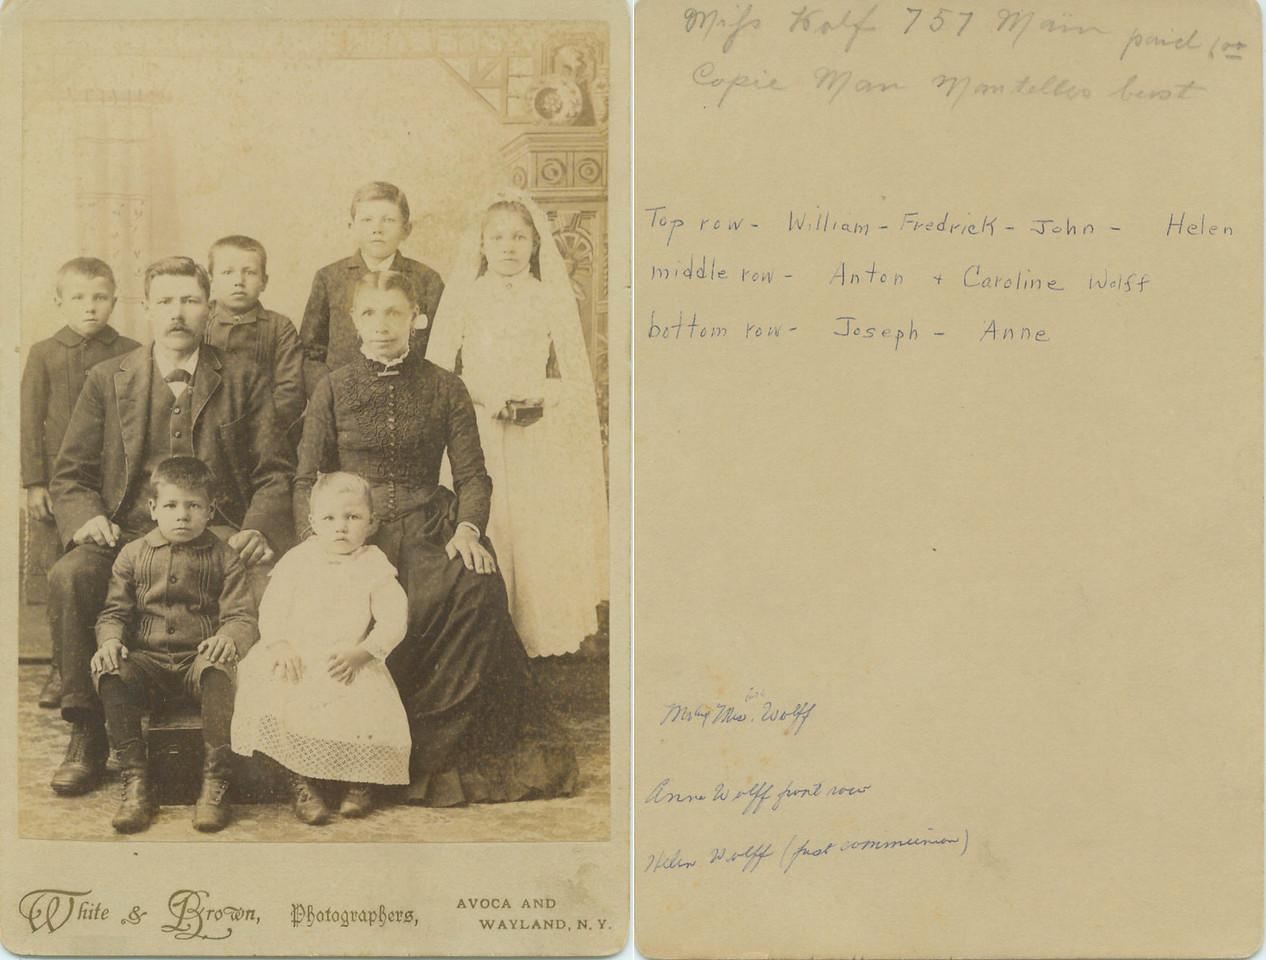 Anton and Caroline Wolff Family